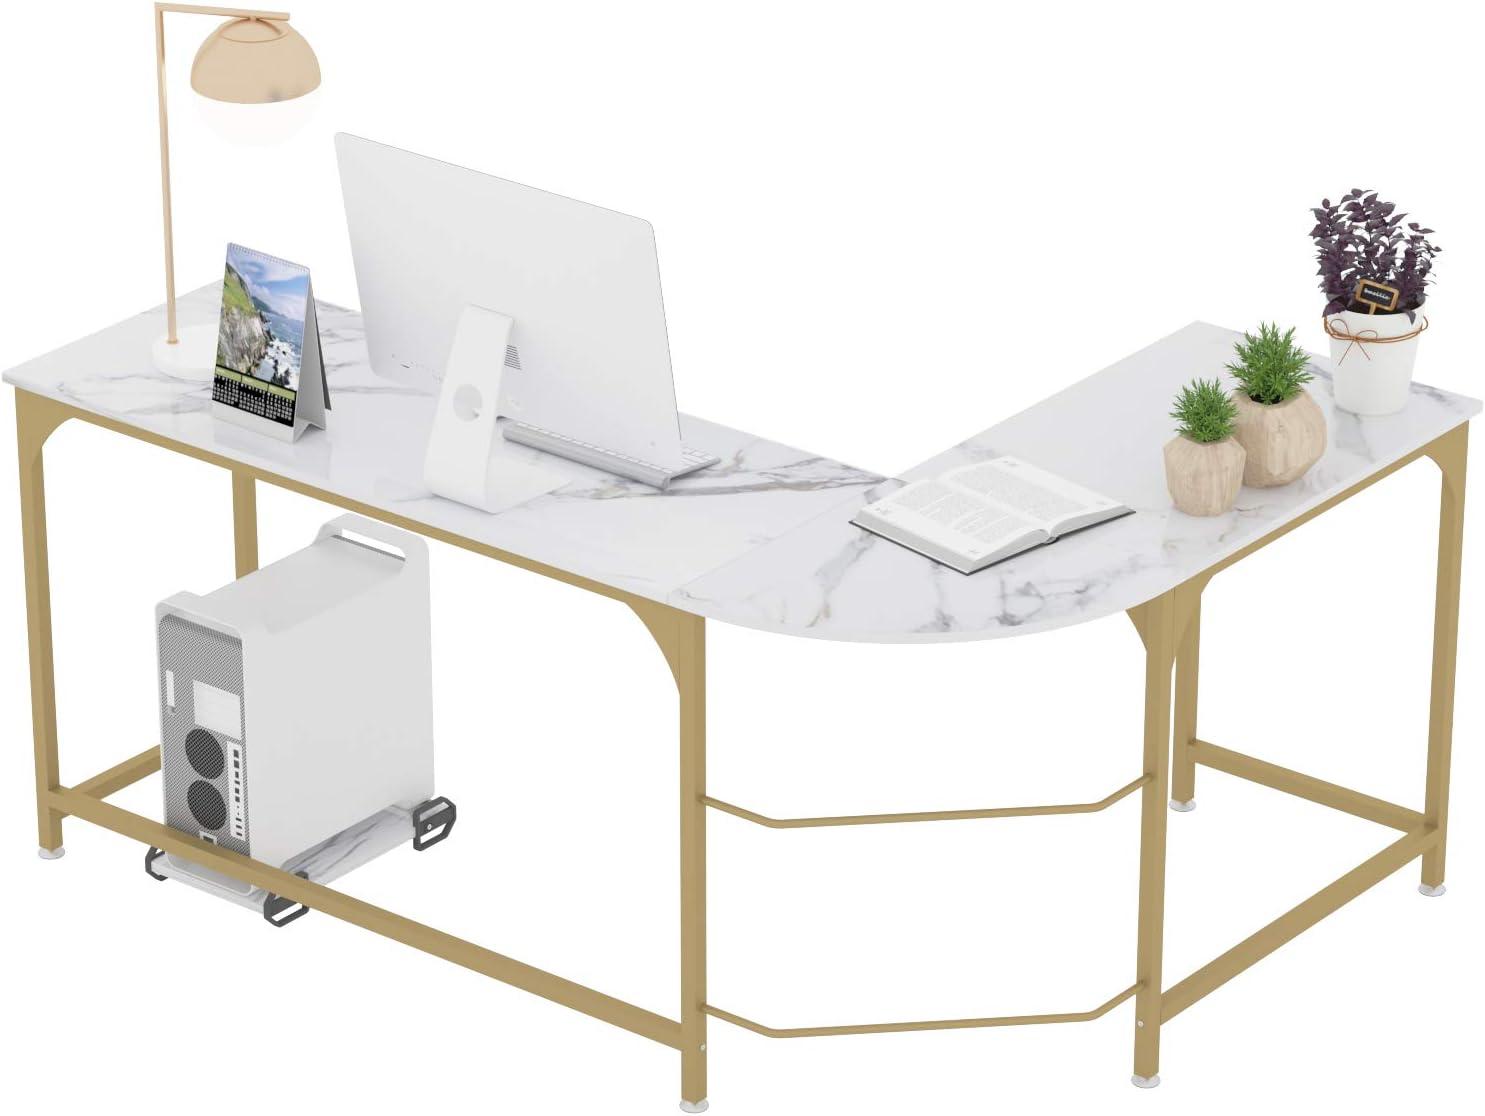 Teraves Reversible L-Shaped Desk Corner Gaming Computer Desk Office Workstation Modern Home Study Writing Wooden Table (Large, White Marbling+ Gold Frame)